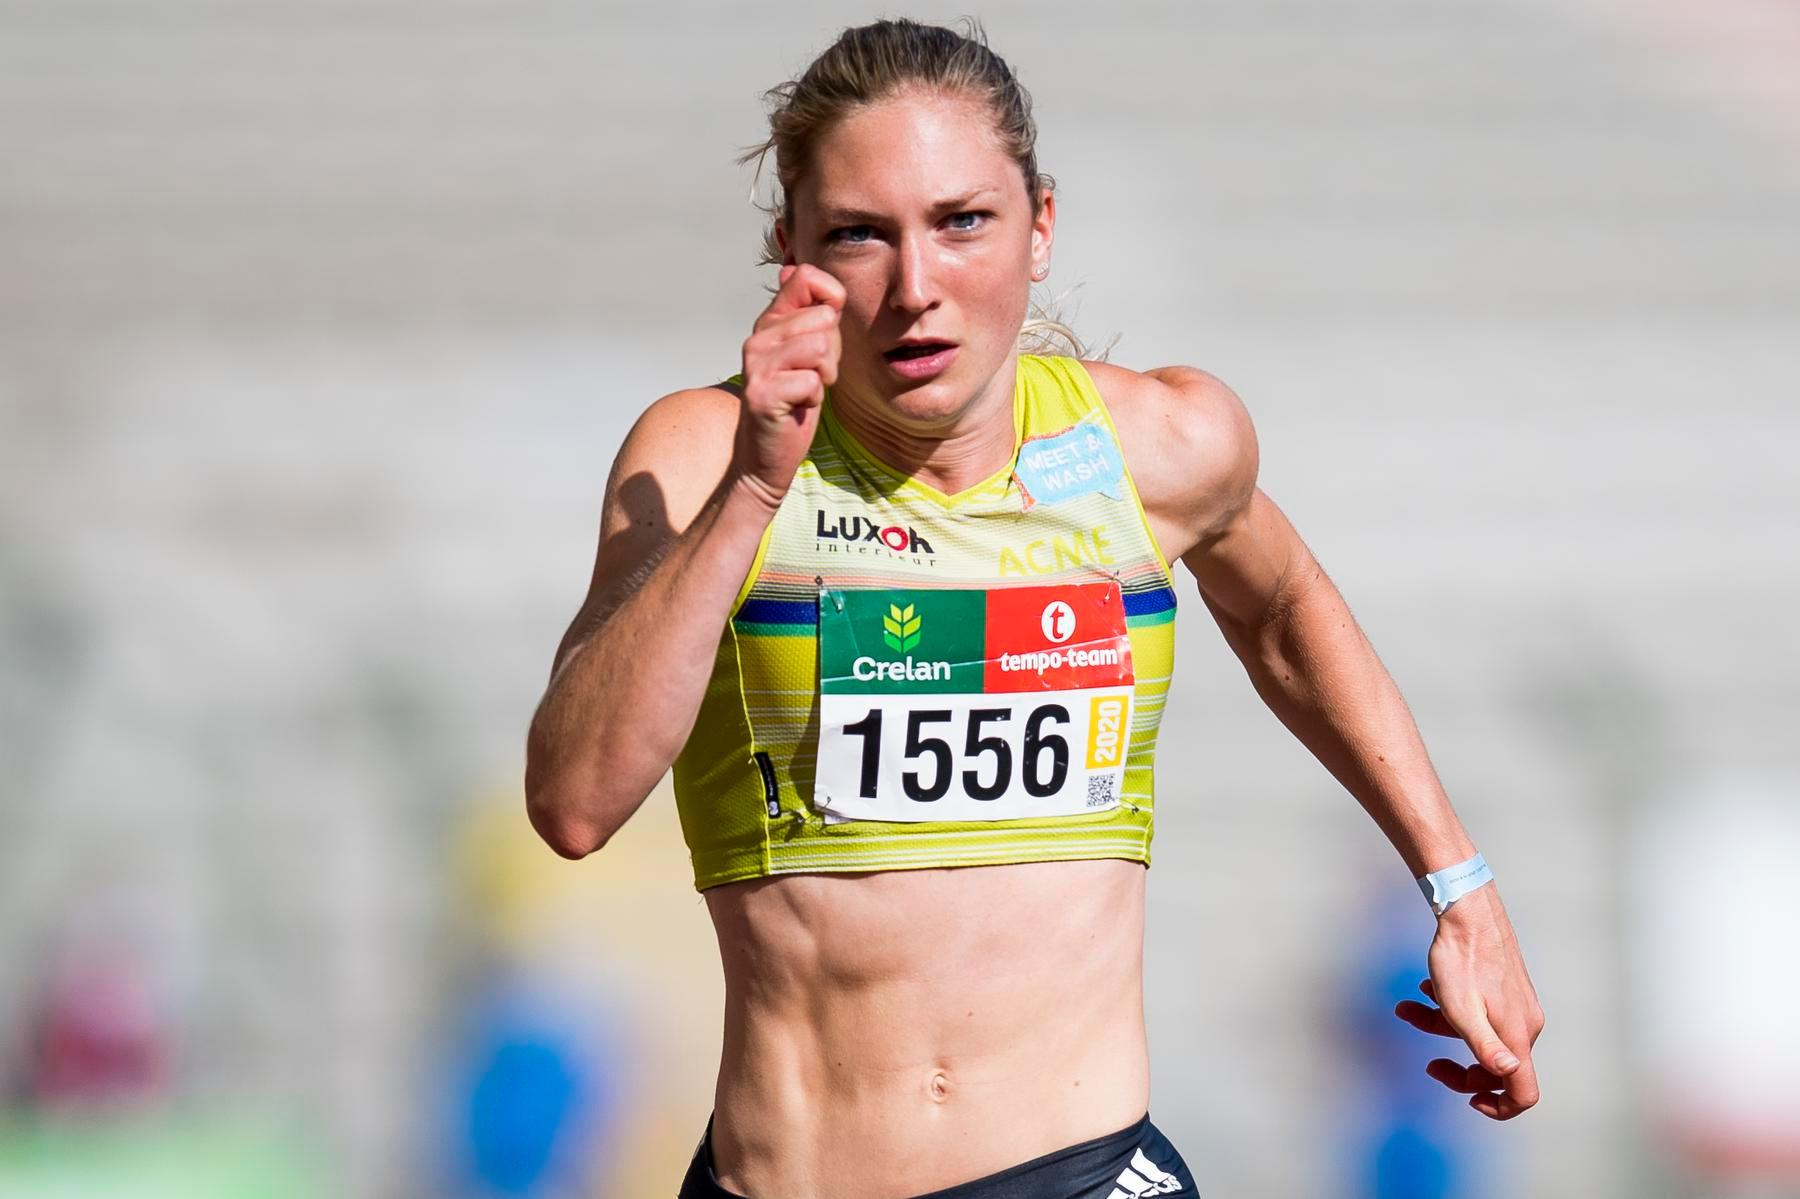 West-Vlaamse atleten: